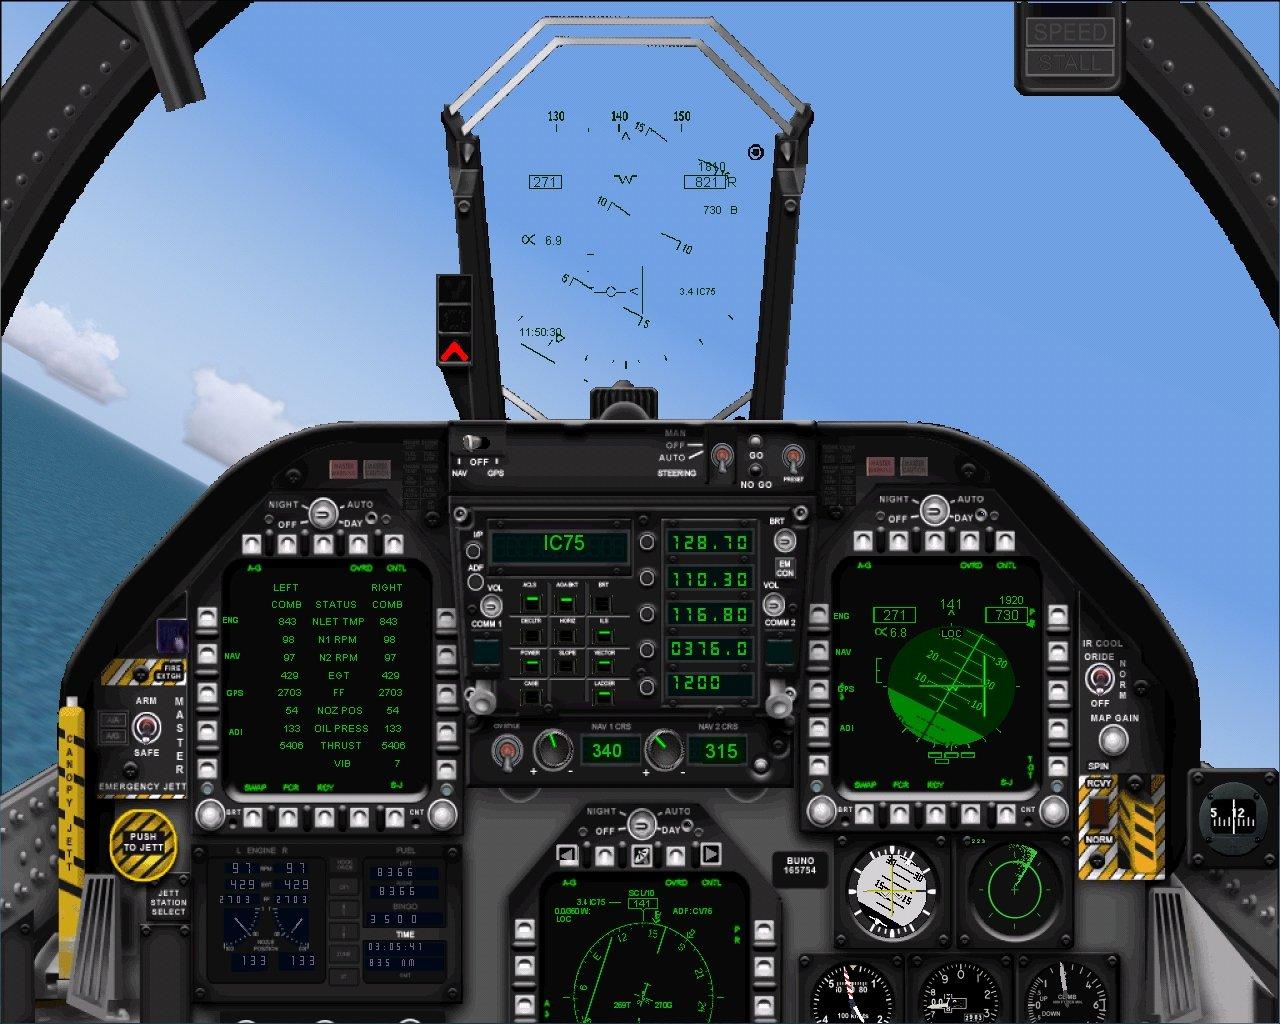 http://3.bp.blogspot.com/-xpZ181HF37s/TkgkHaELzqI/AAAAAAAAKg8/WFxQW-d4z8Y/s1600/FA-18+Hornet+Cockpit+%25283%2529.jpg